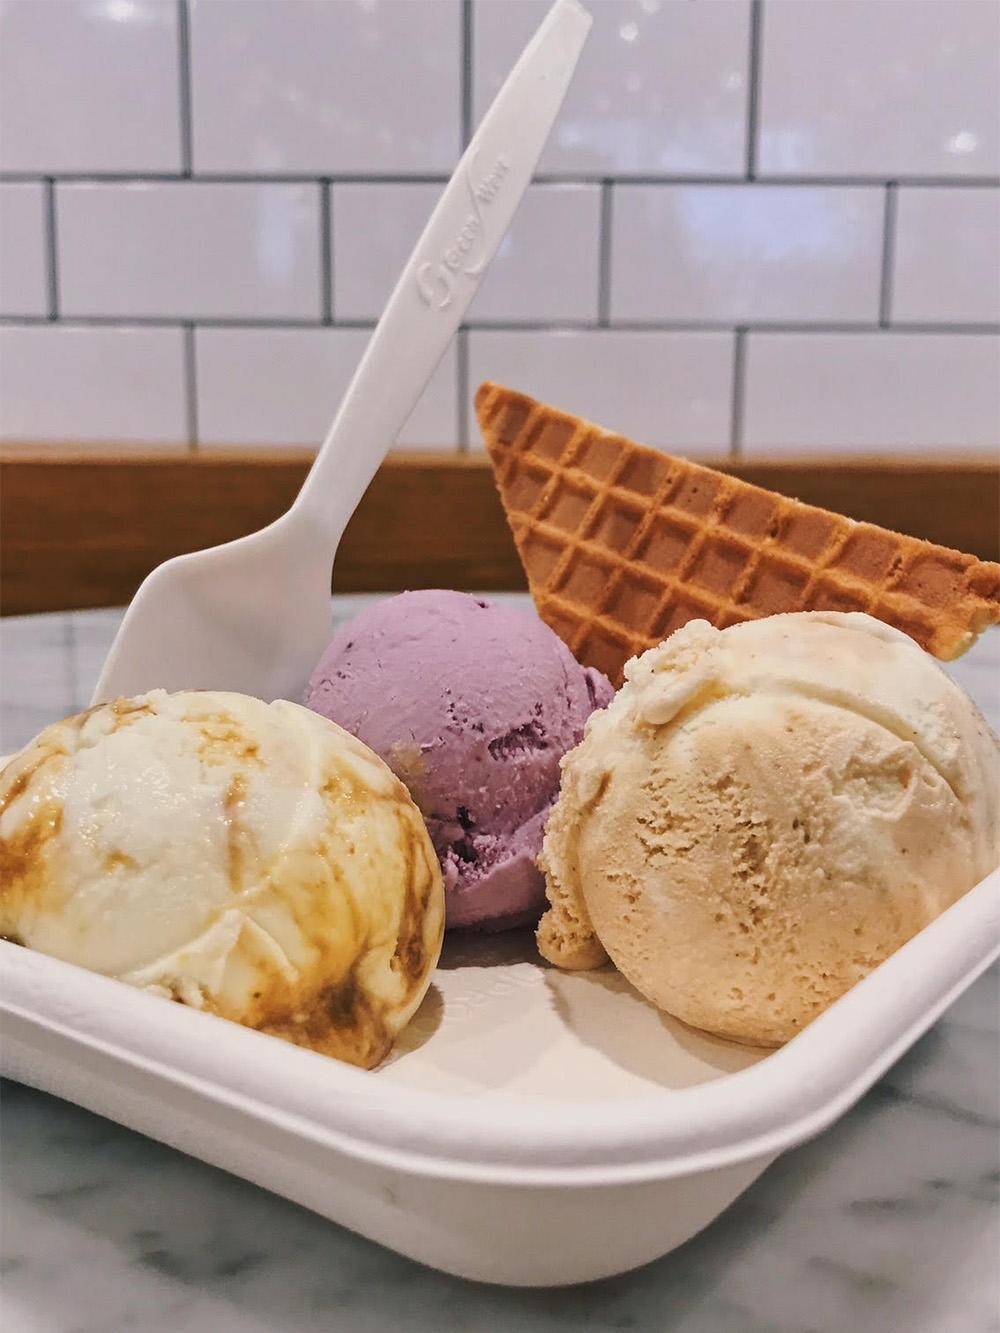 Creative Flavored Ice Creams at Jeni's Splendid Ice Cream